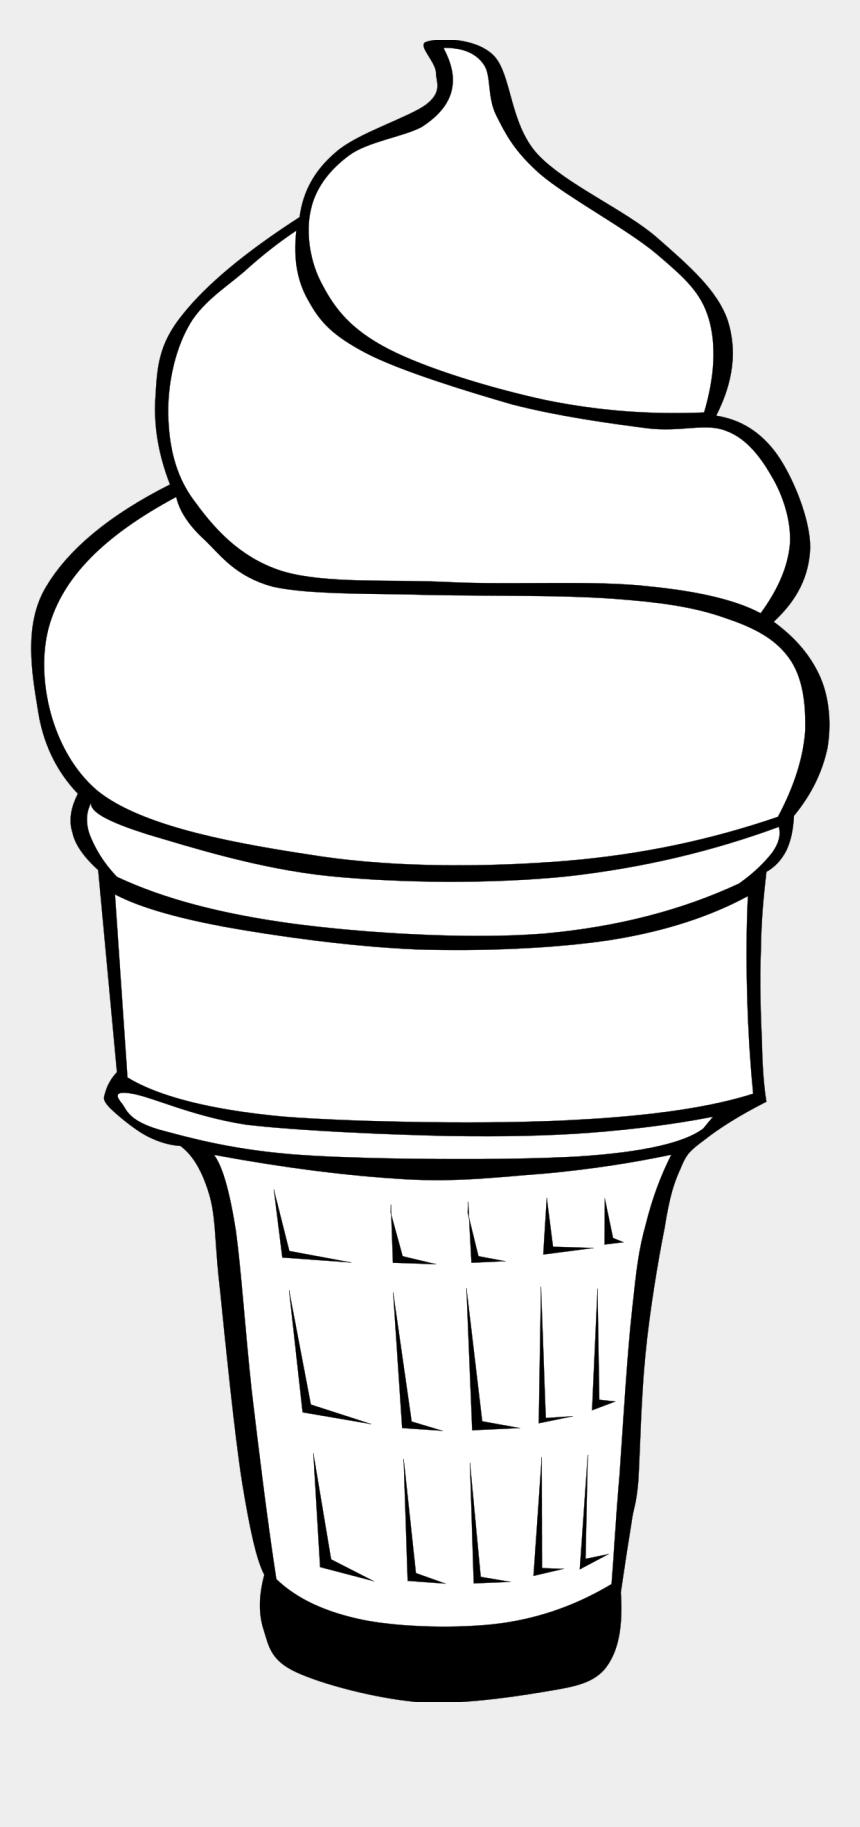 food clip art, Cartoons - Fast Food, Desserts, Ice Cream Cones, Soft Serve - Ice Cream Clipart Black And White